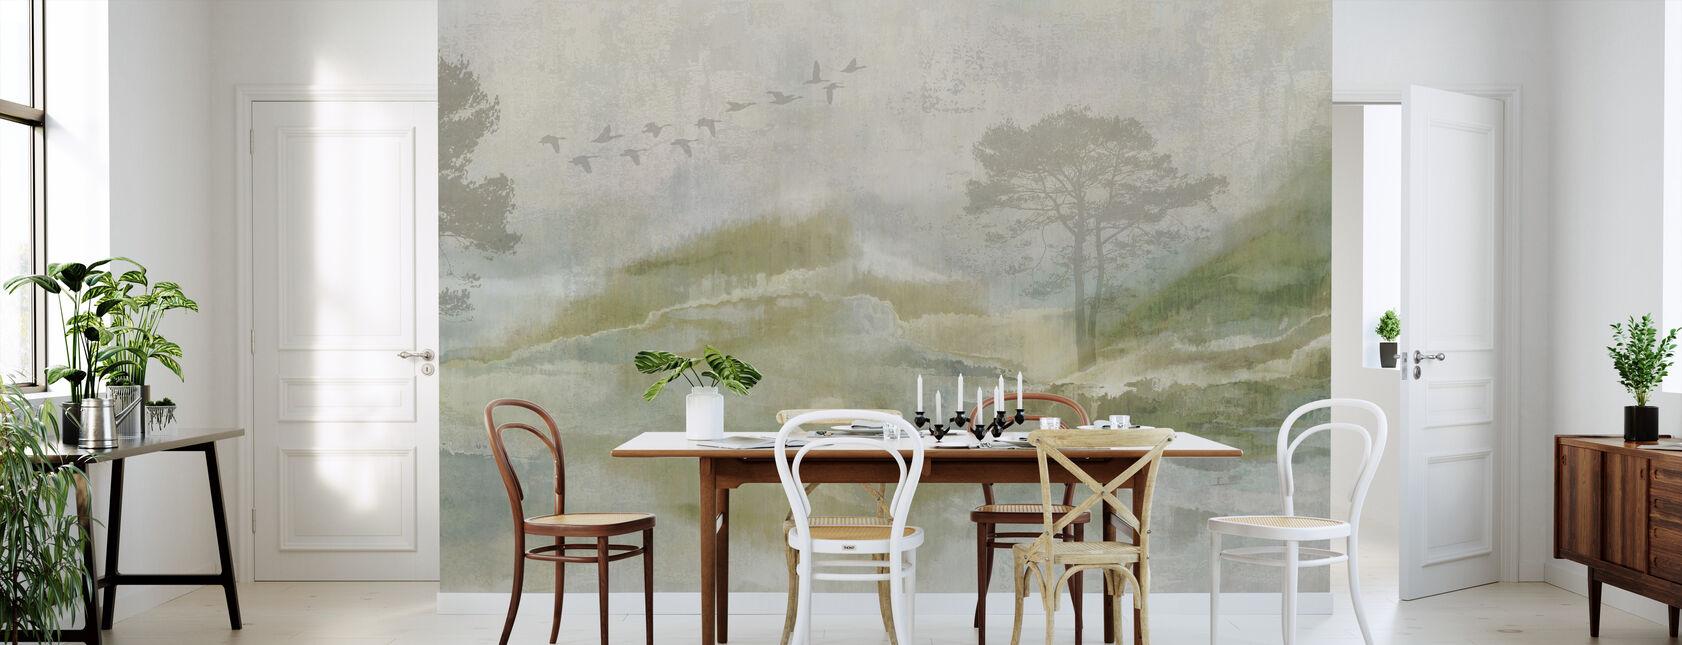 Dreamy Landscape - Wallpaper - Kitchen